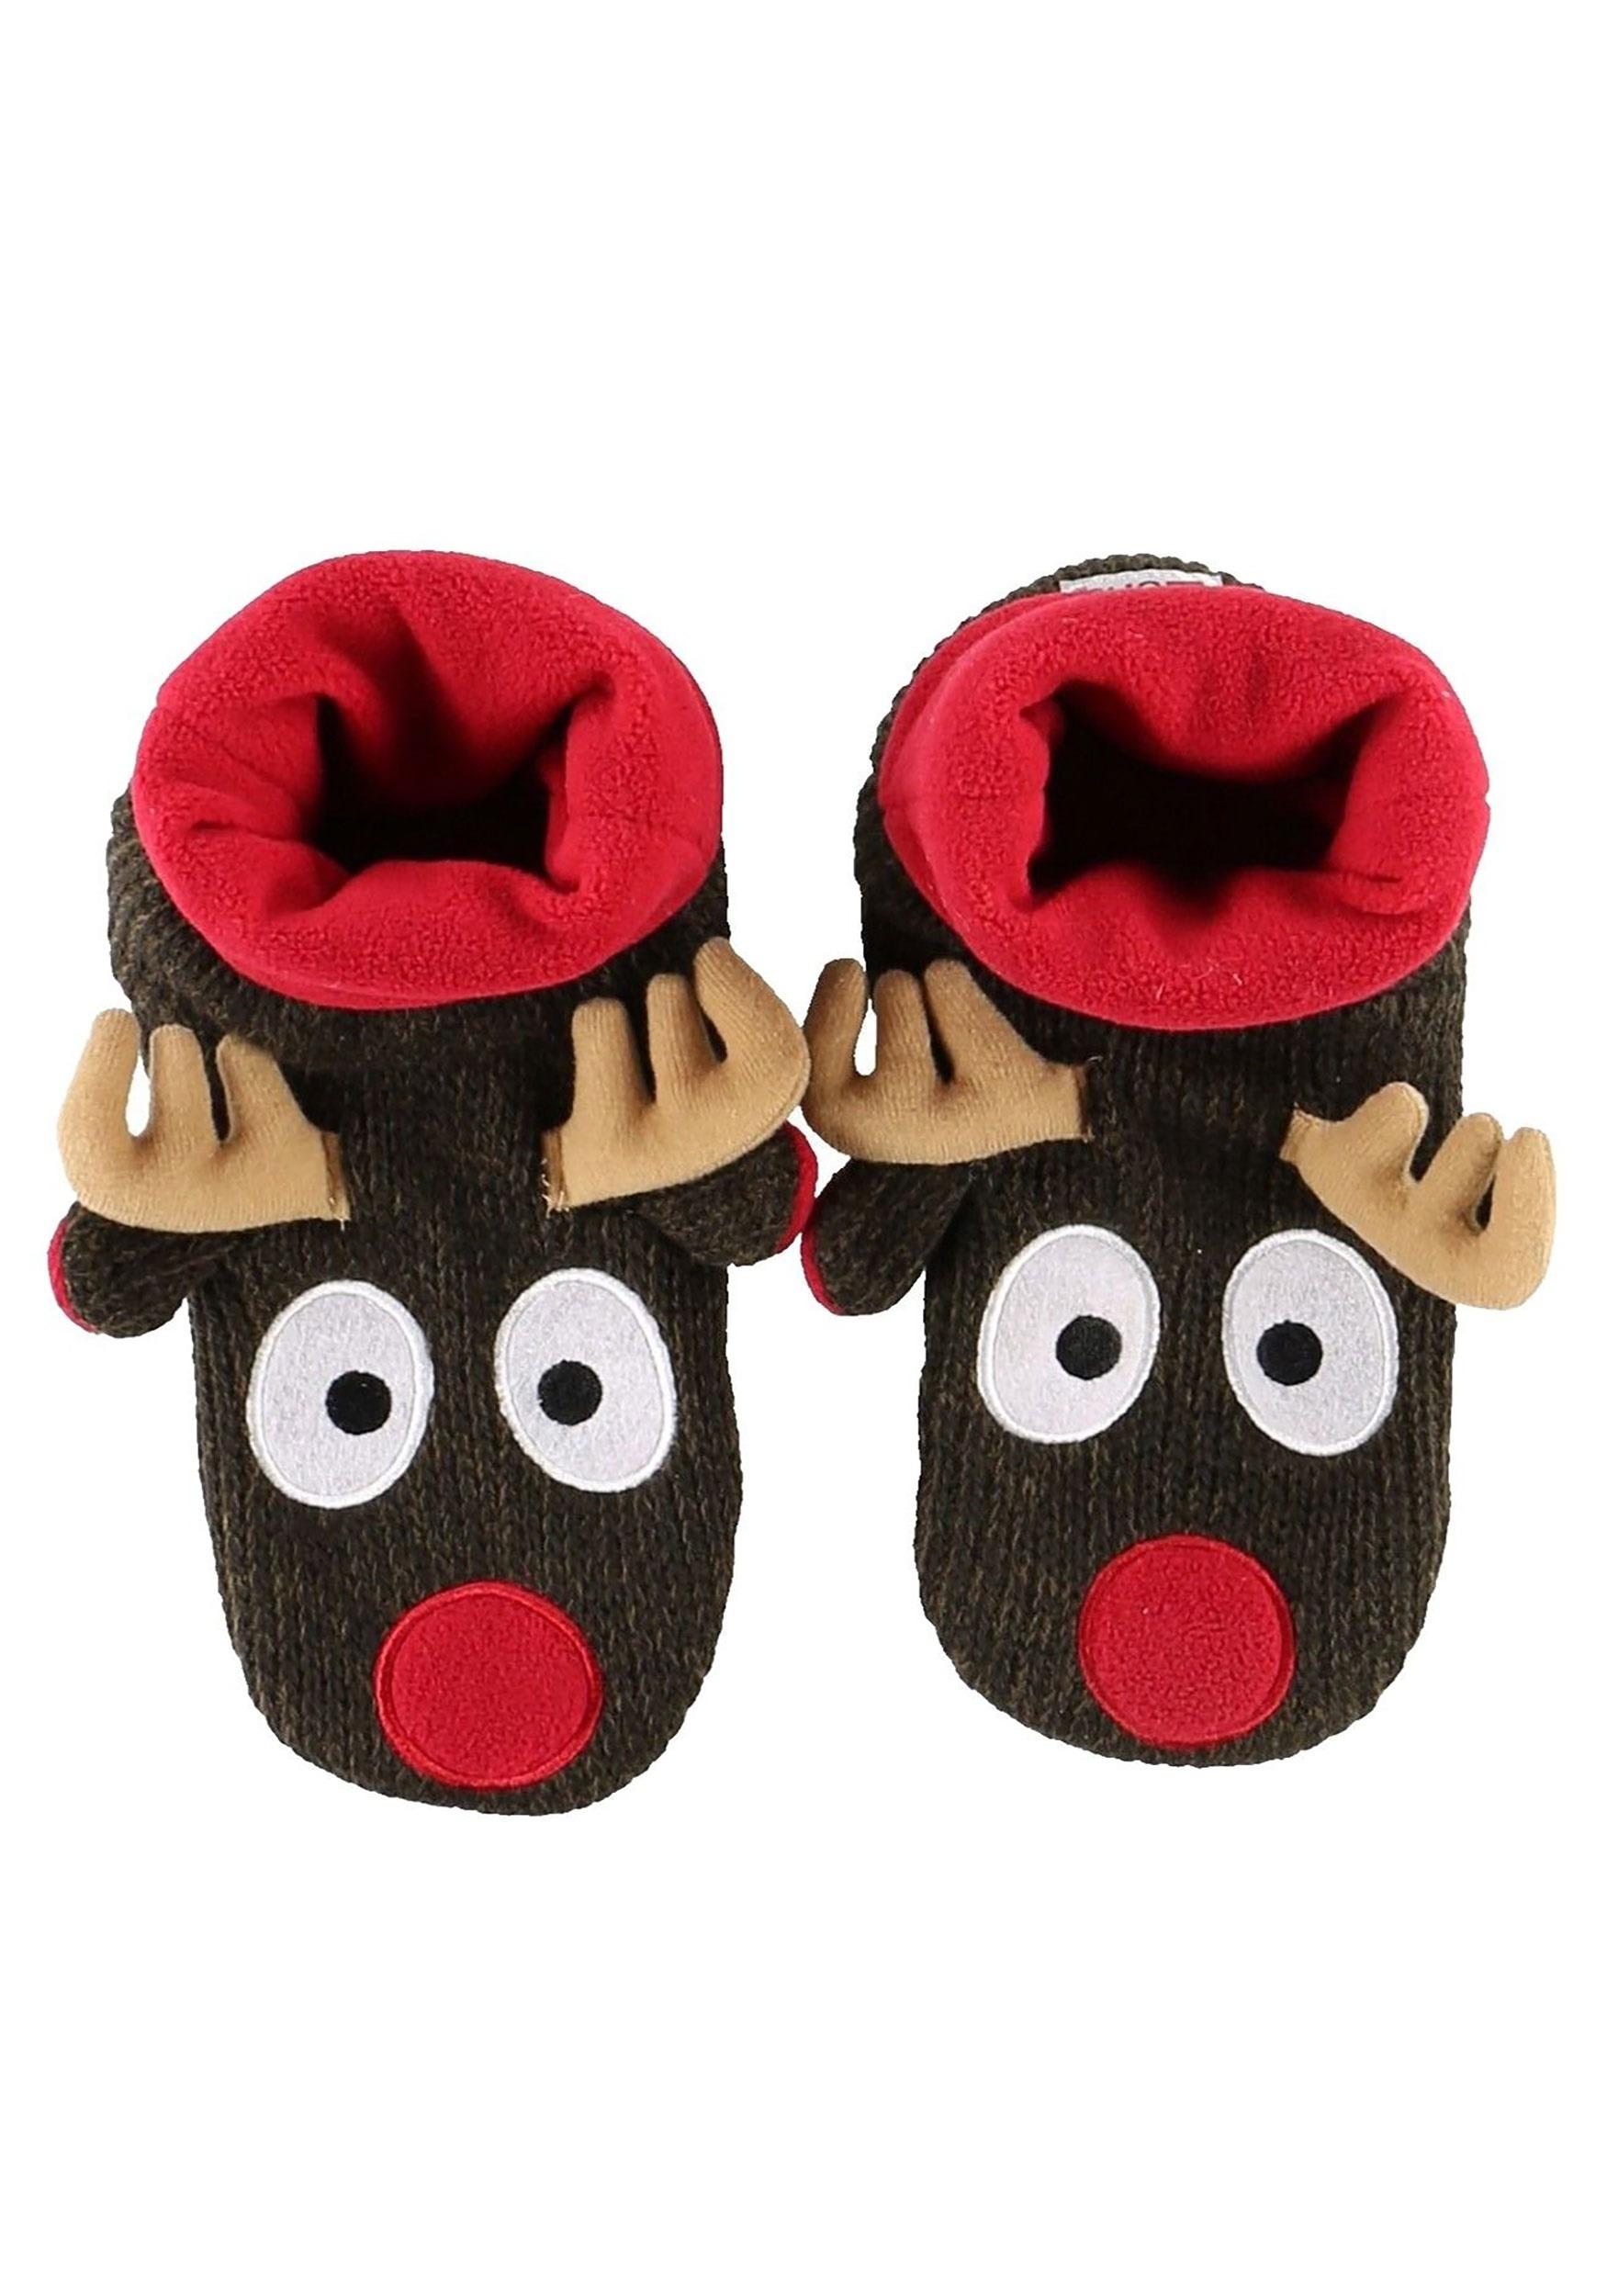 Boys Slippers 3D Plush Novelty Fun Gift Christmas